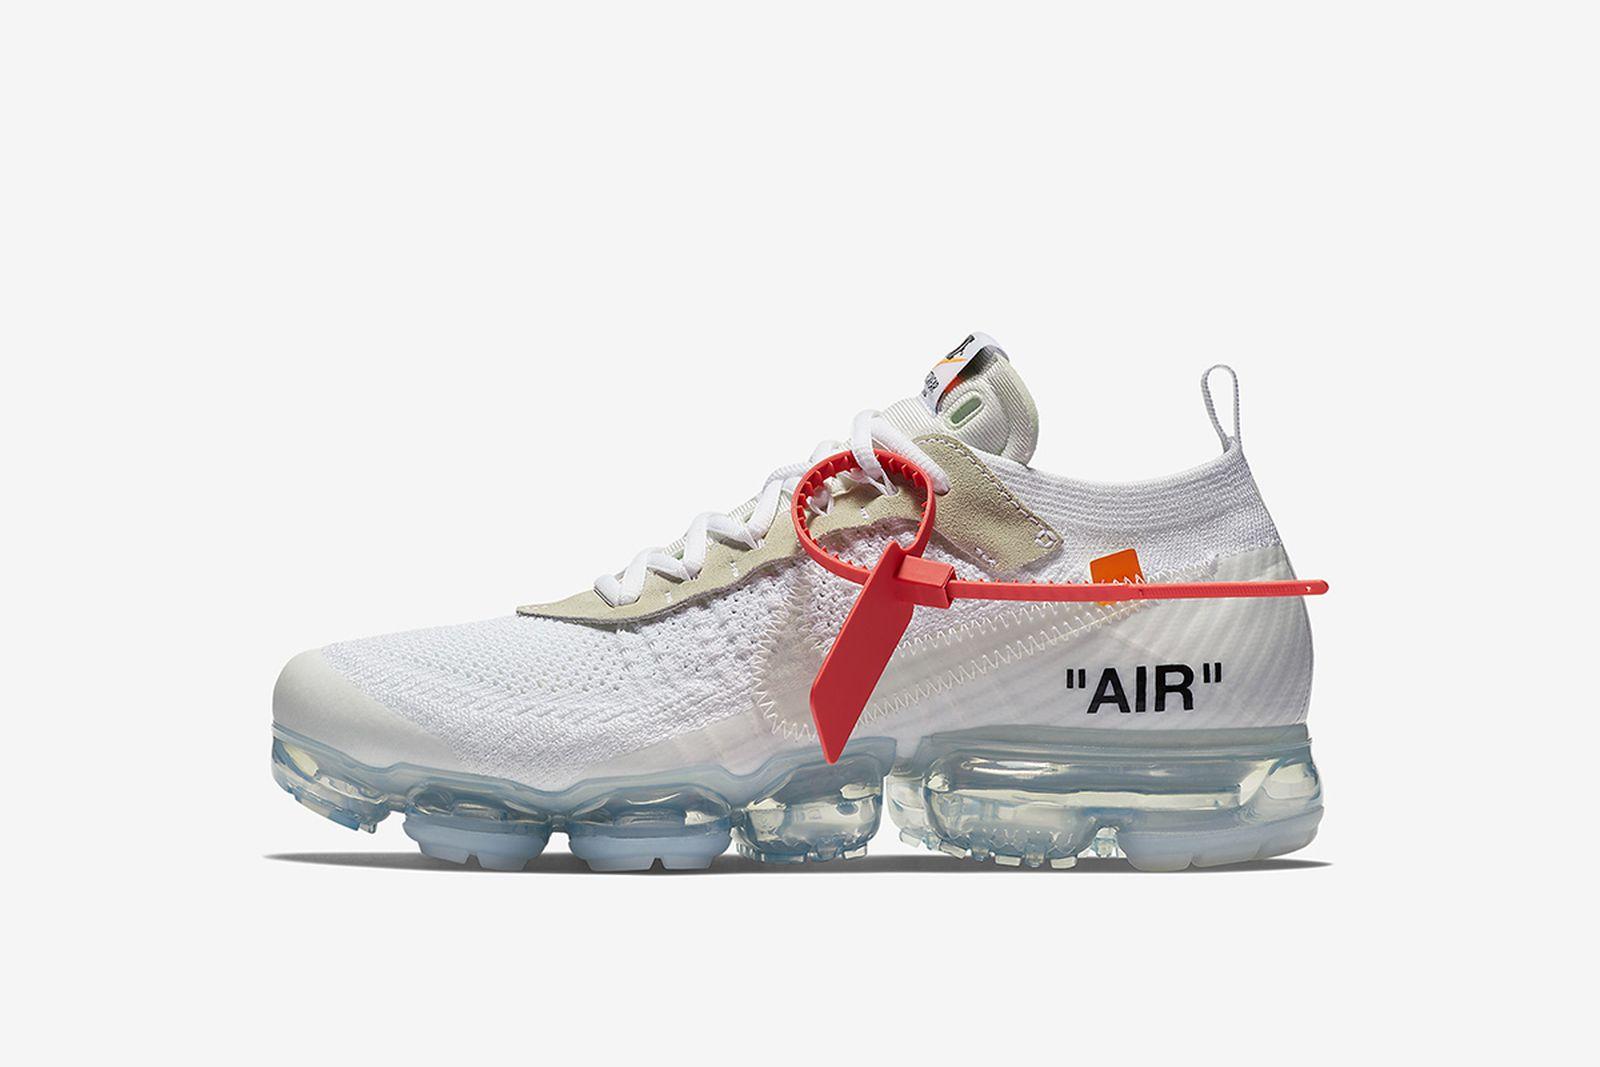 vapormax grey GOAT Nike The Ten OFF-WHITE c/o Virgil Abloh